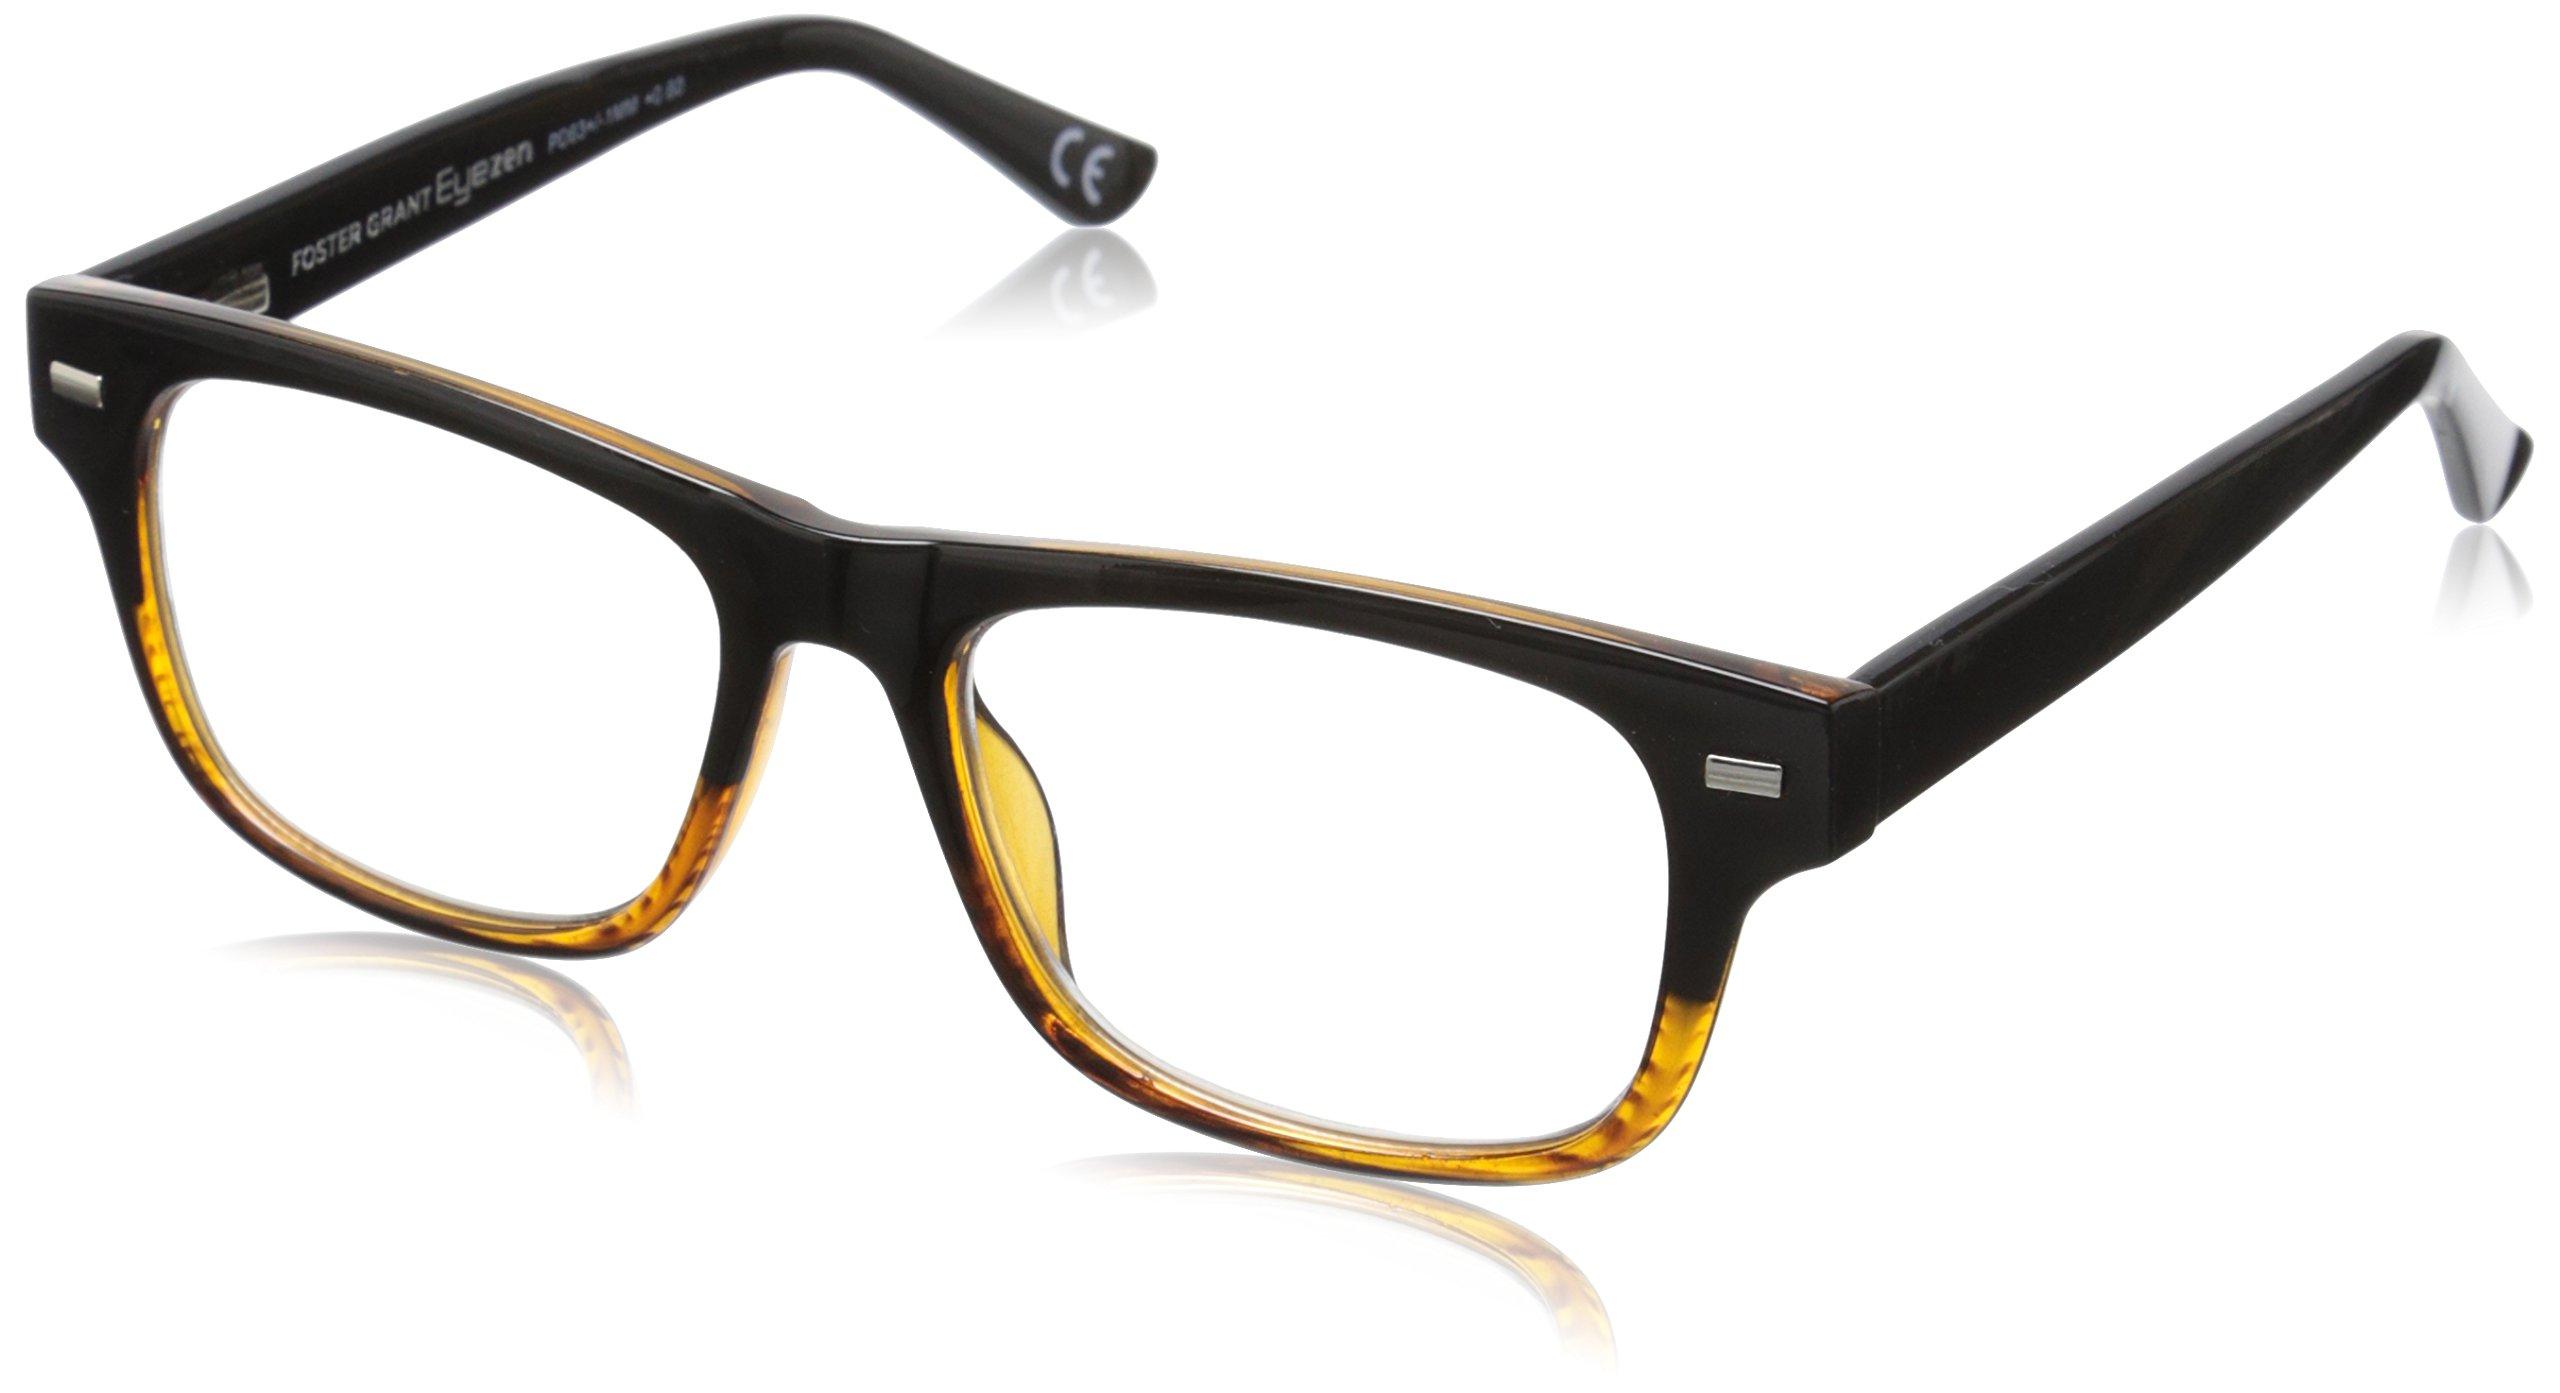 Foster Grant Eyezen Digital Glasses -  Black/Brown Stripe